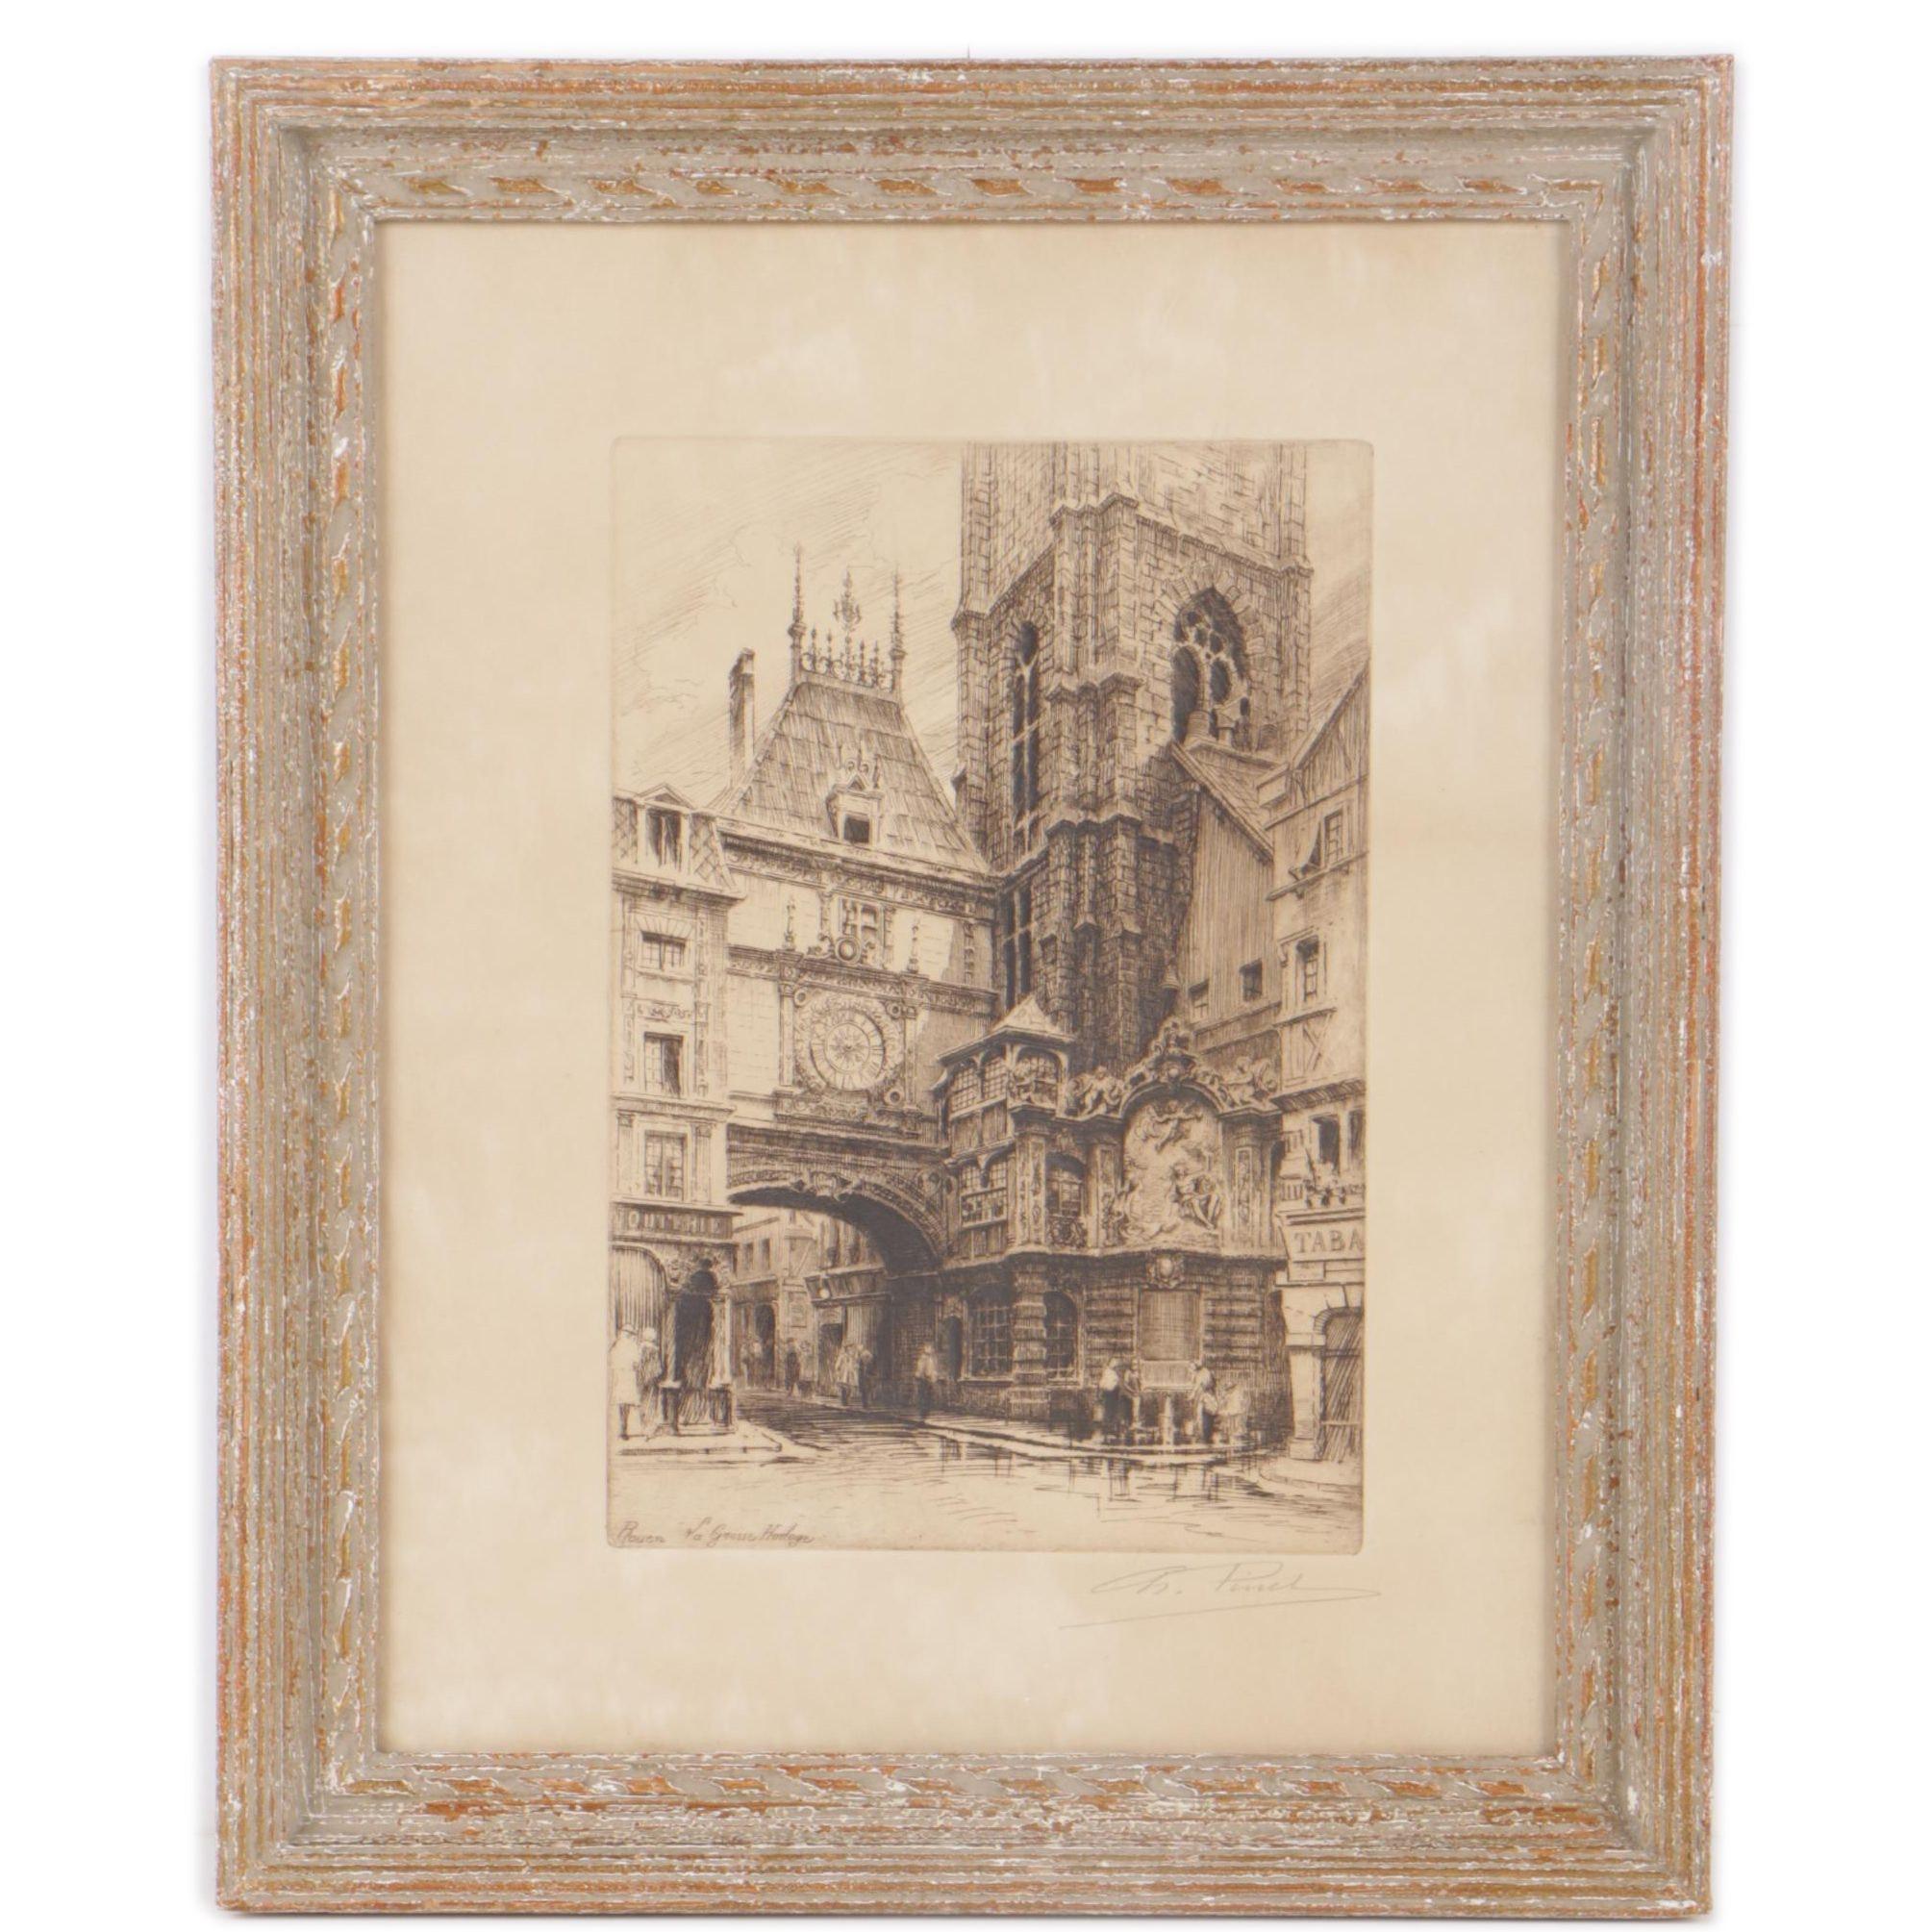 "Charles Pinet Etching ""Rouen - La Grosse Horloge"""